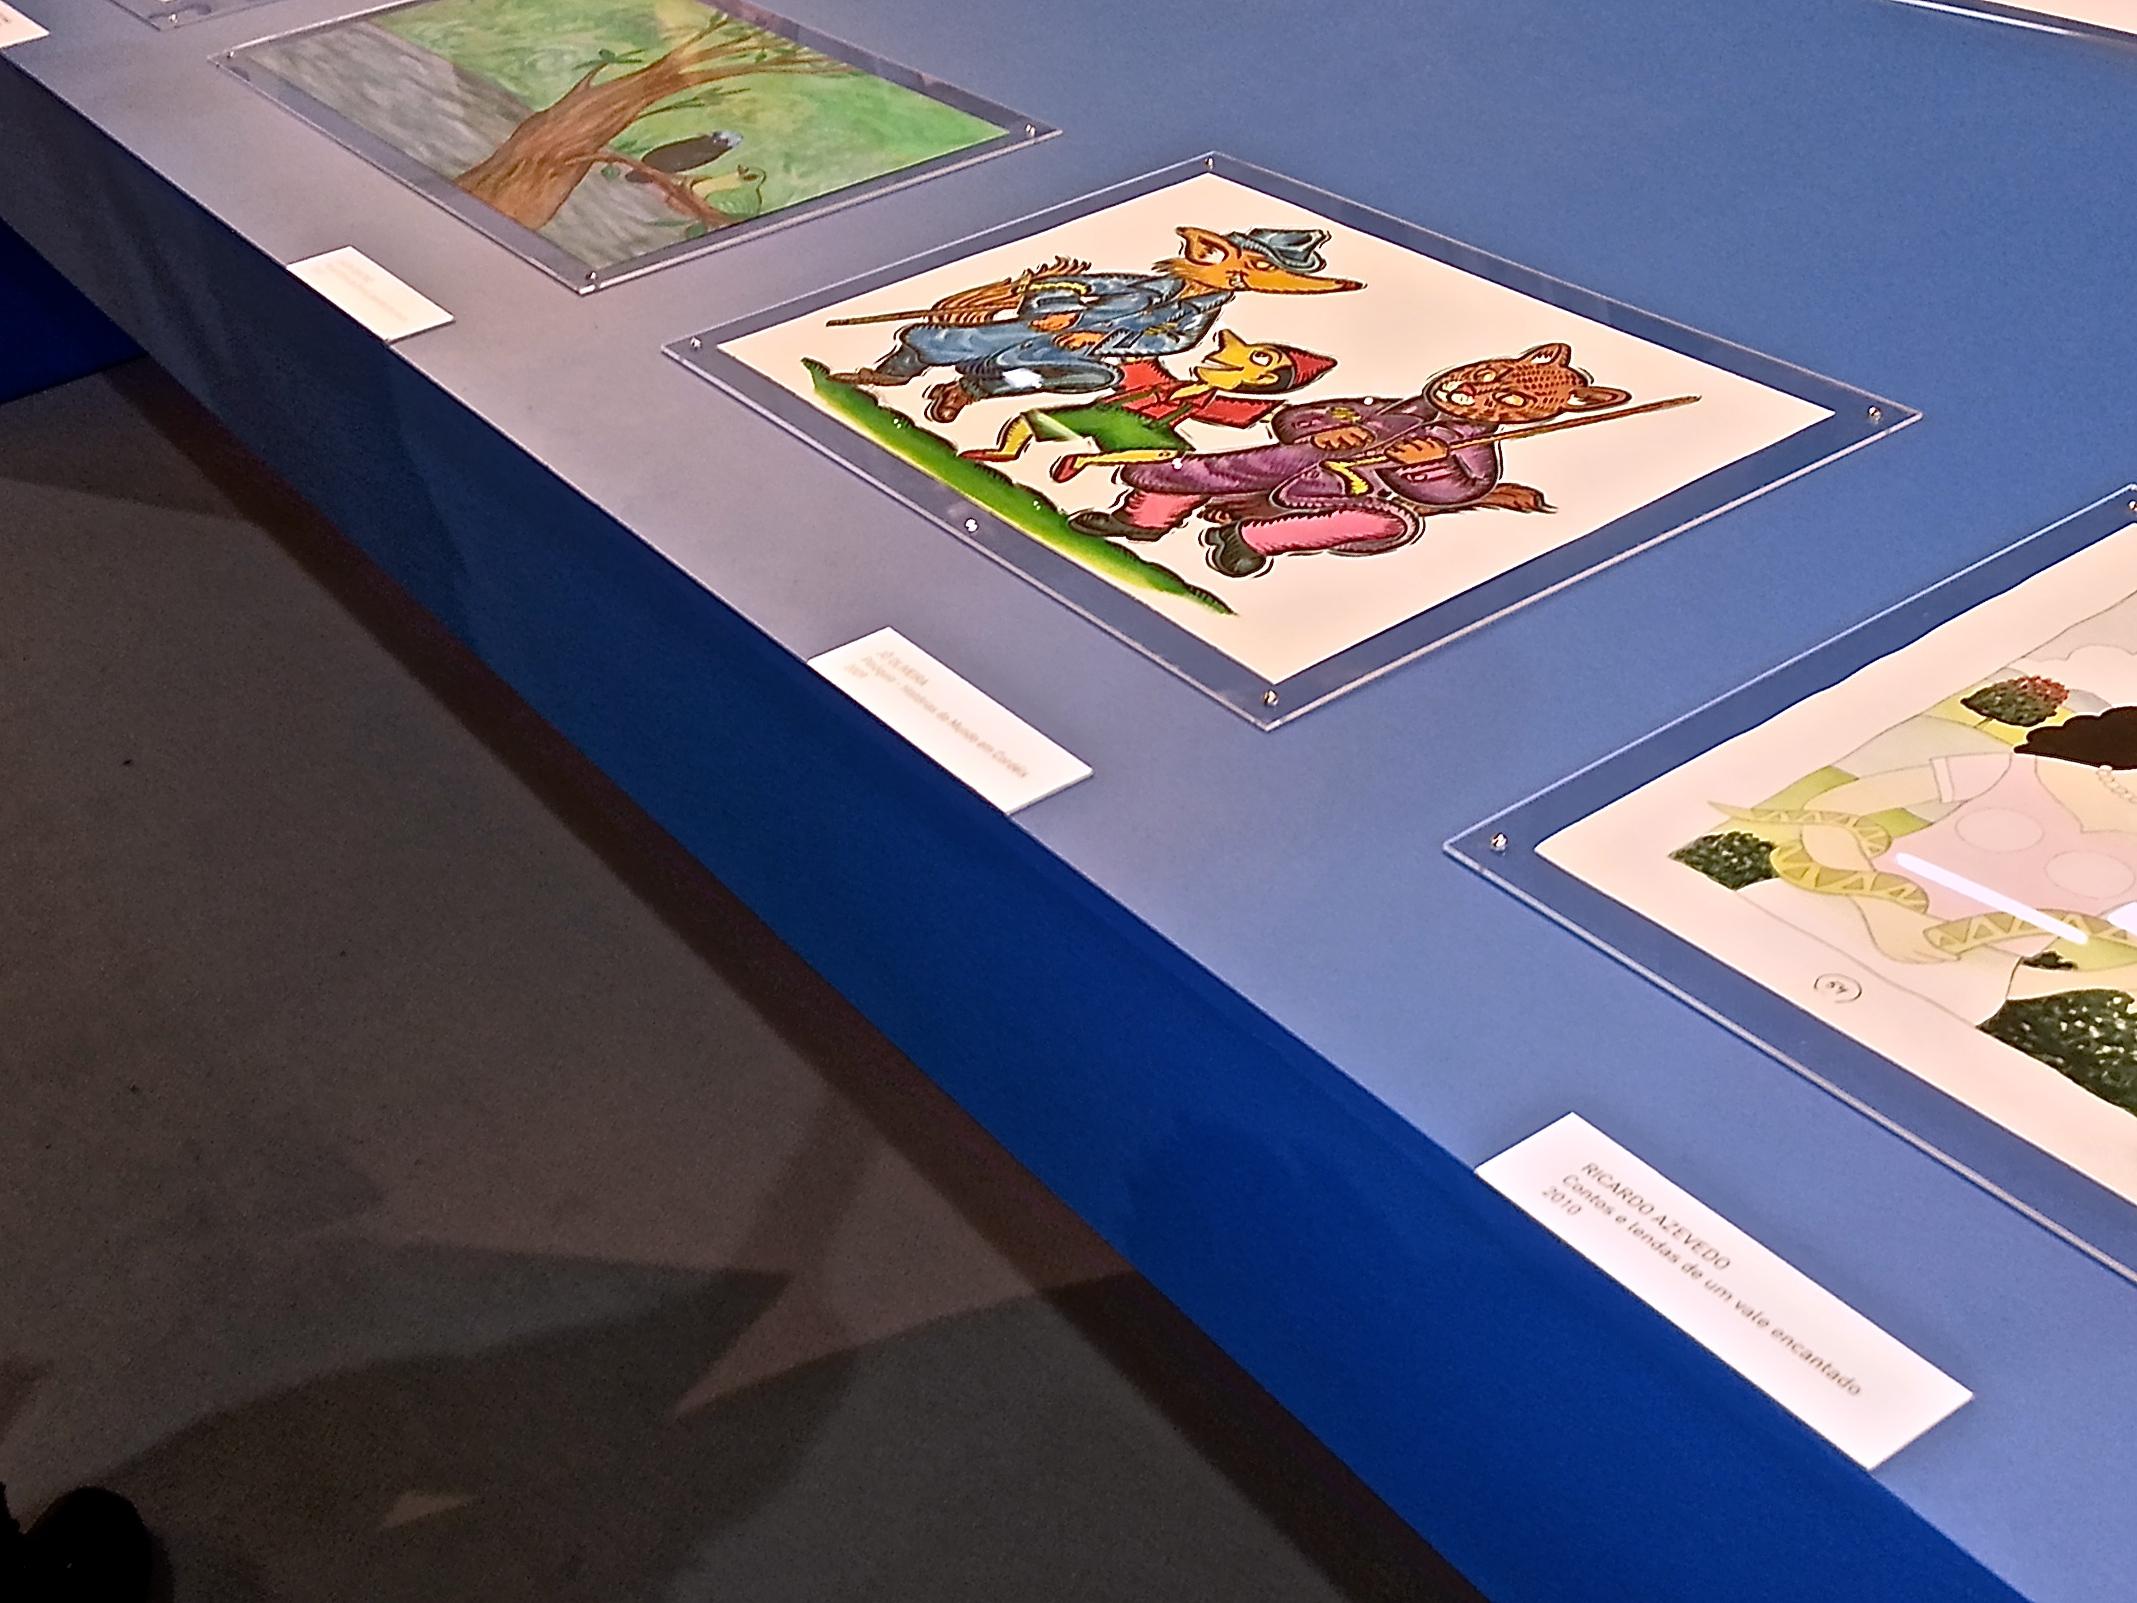 Bologna Children's Book Fair 2014